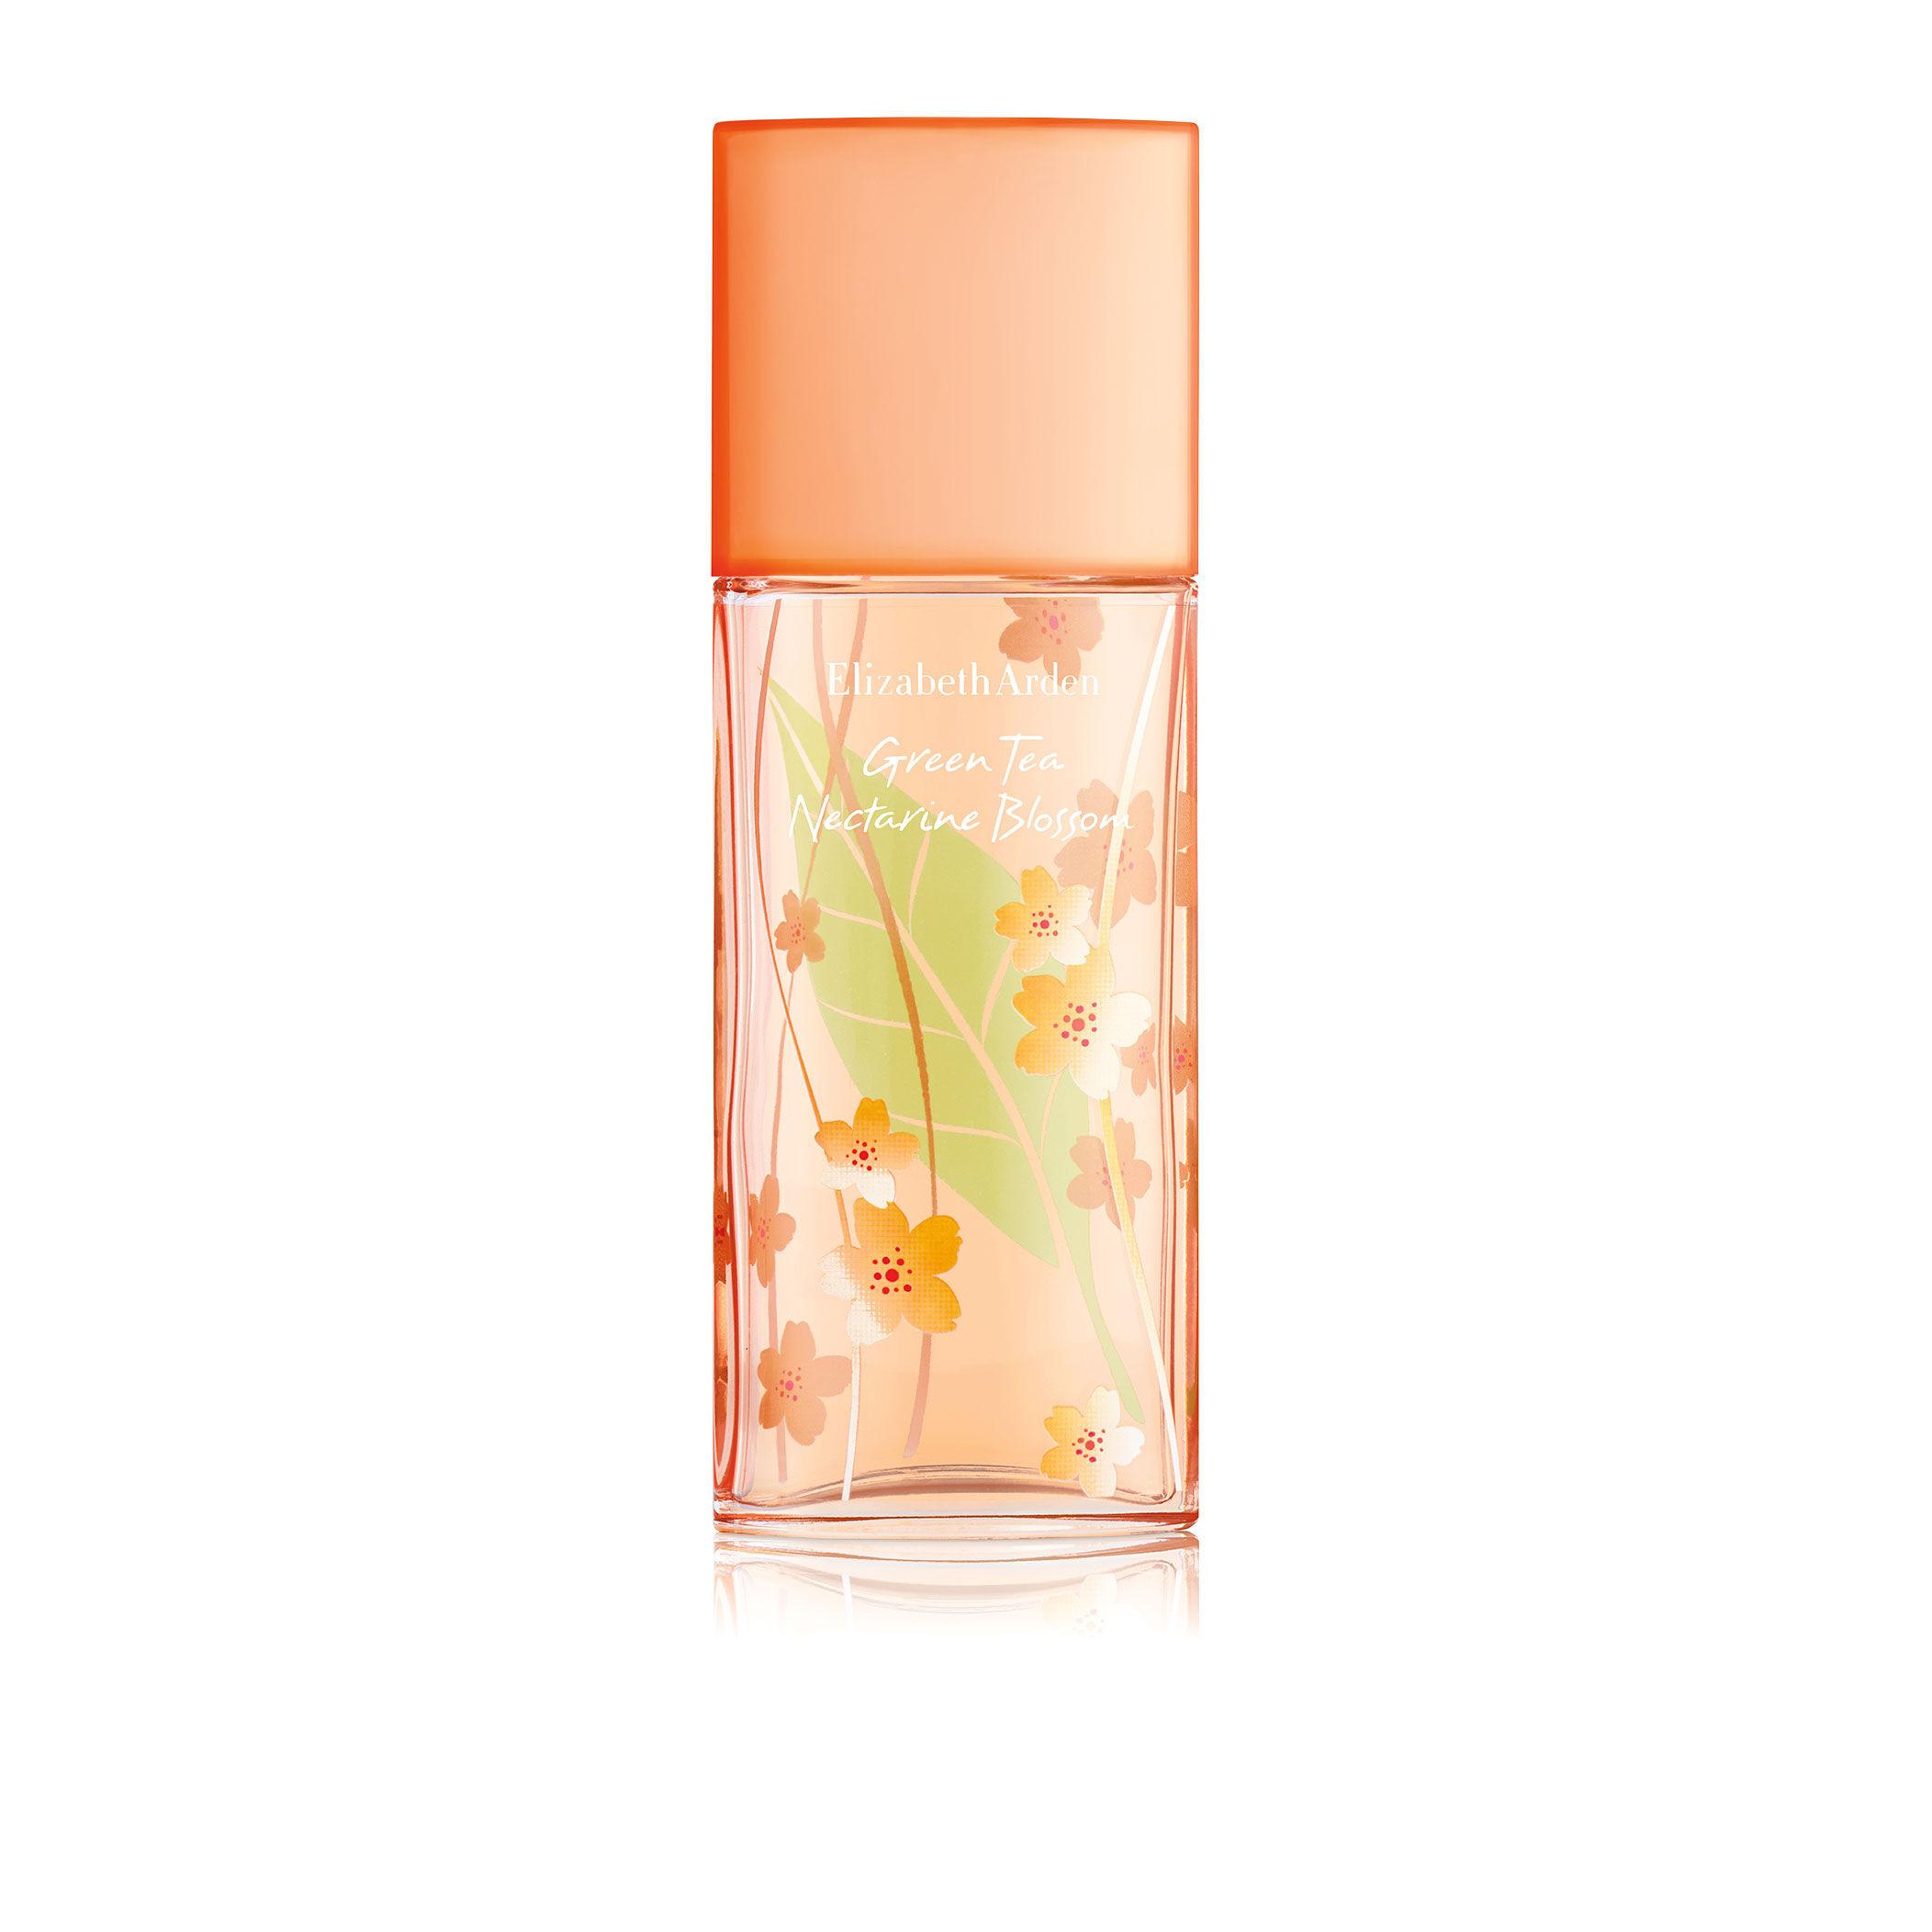 Green Tea Nectarine Blossom Eau de Toilette Spray Elizabeth Arden